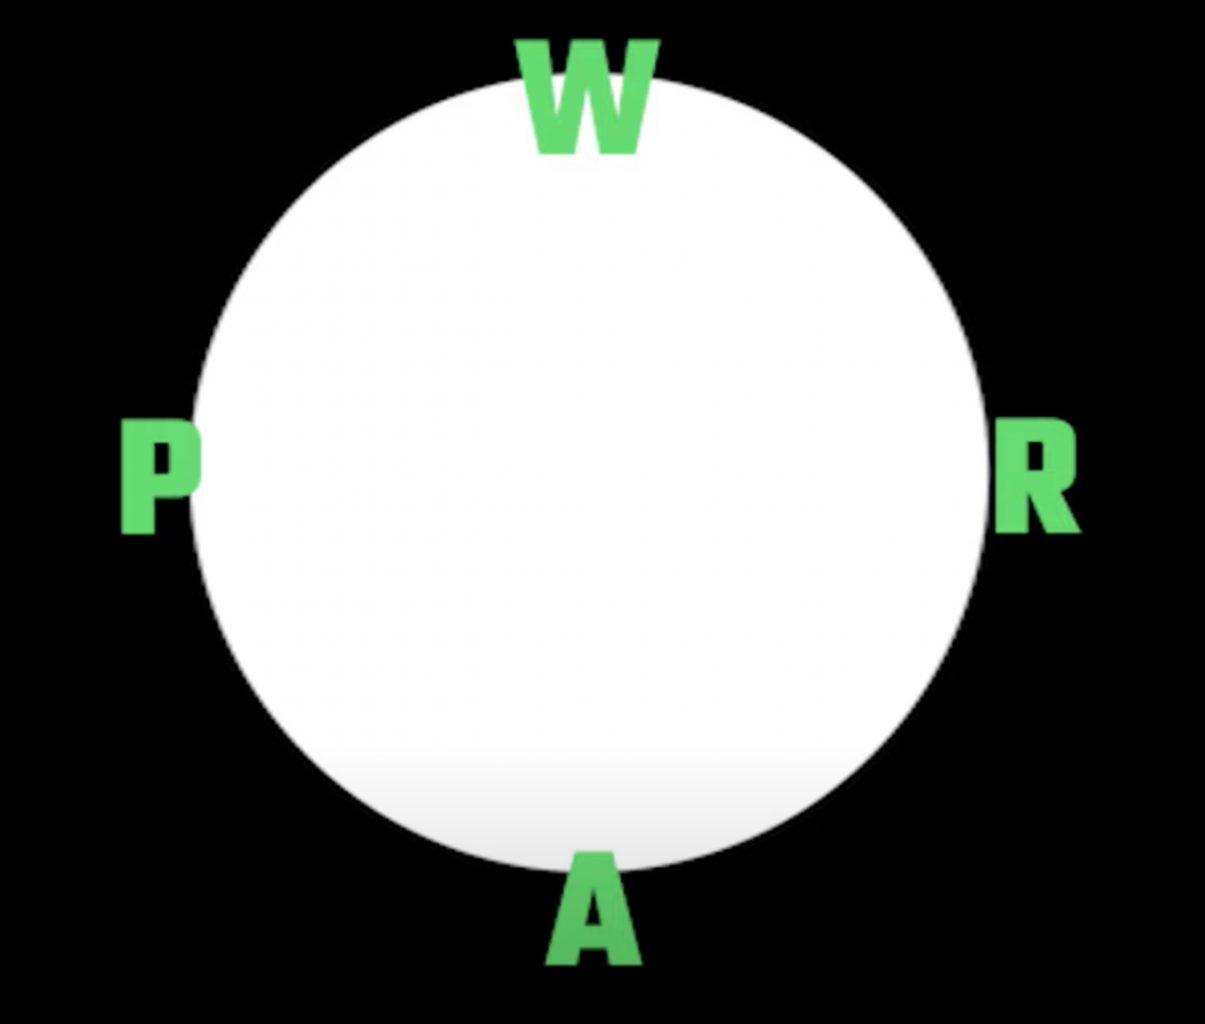 a circle broken into fourths